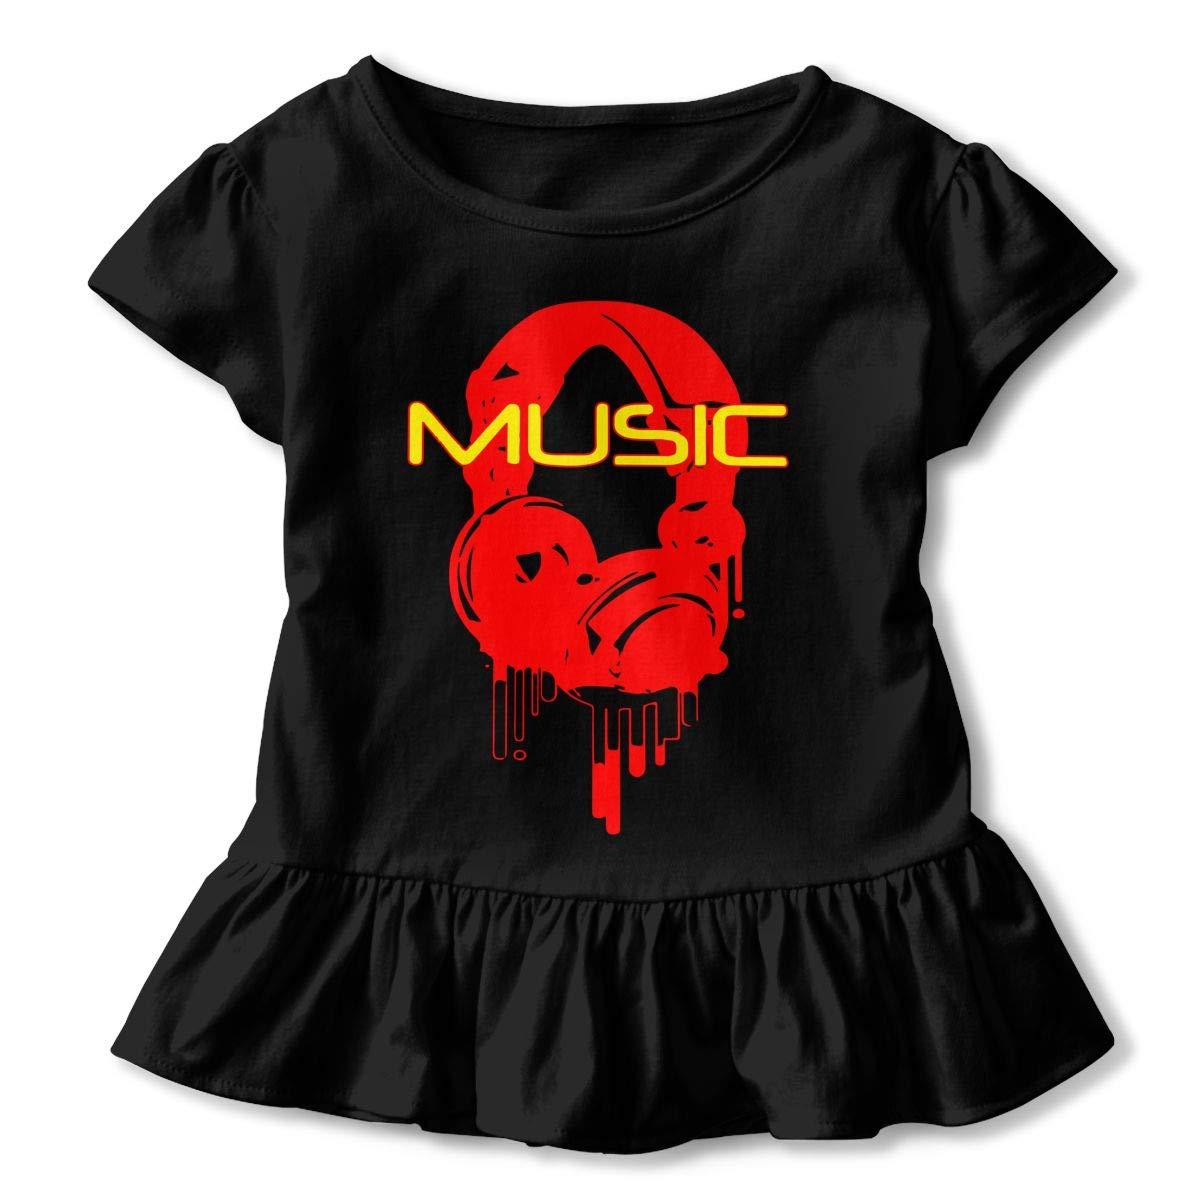 Cheng Jian Bo Melting Microphones Music Note Toddler Girls T Shirt Kids Cotton Short Sleeve Ruffle Tee